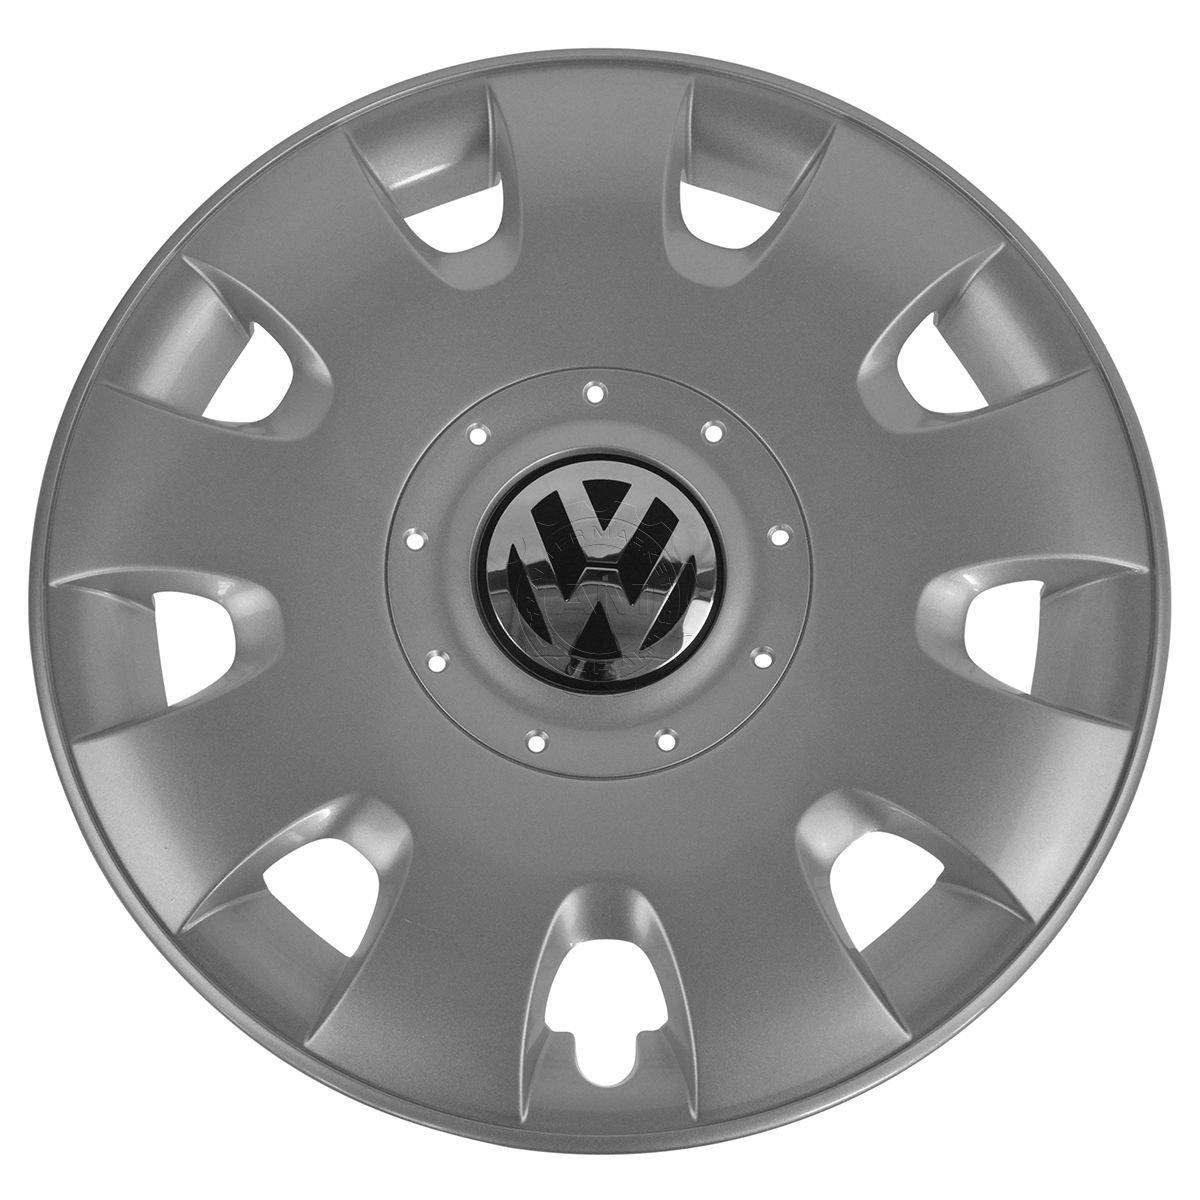 Genuine Diamond silverhigh chrome wheel trim rings VW 1T0601147RGZ by Volkswagen